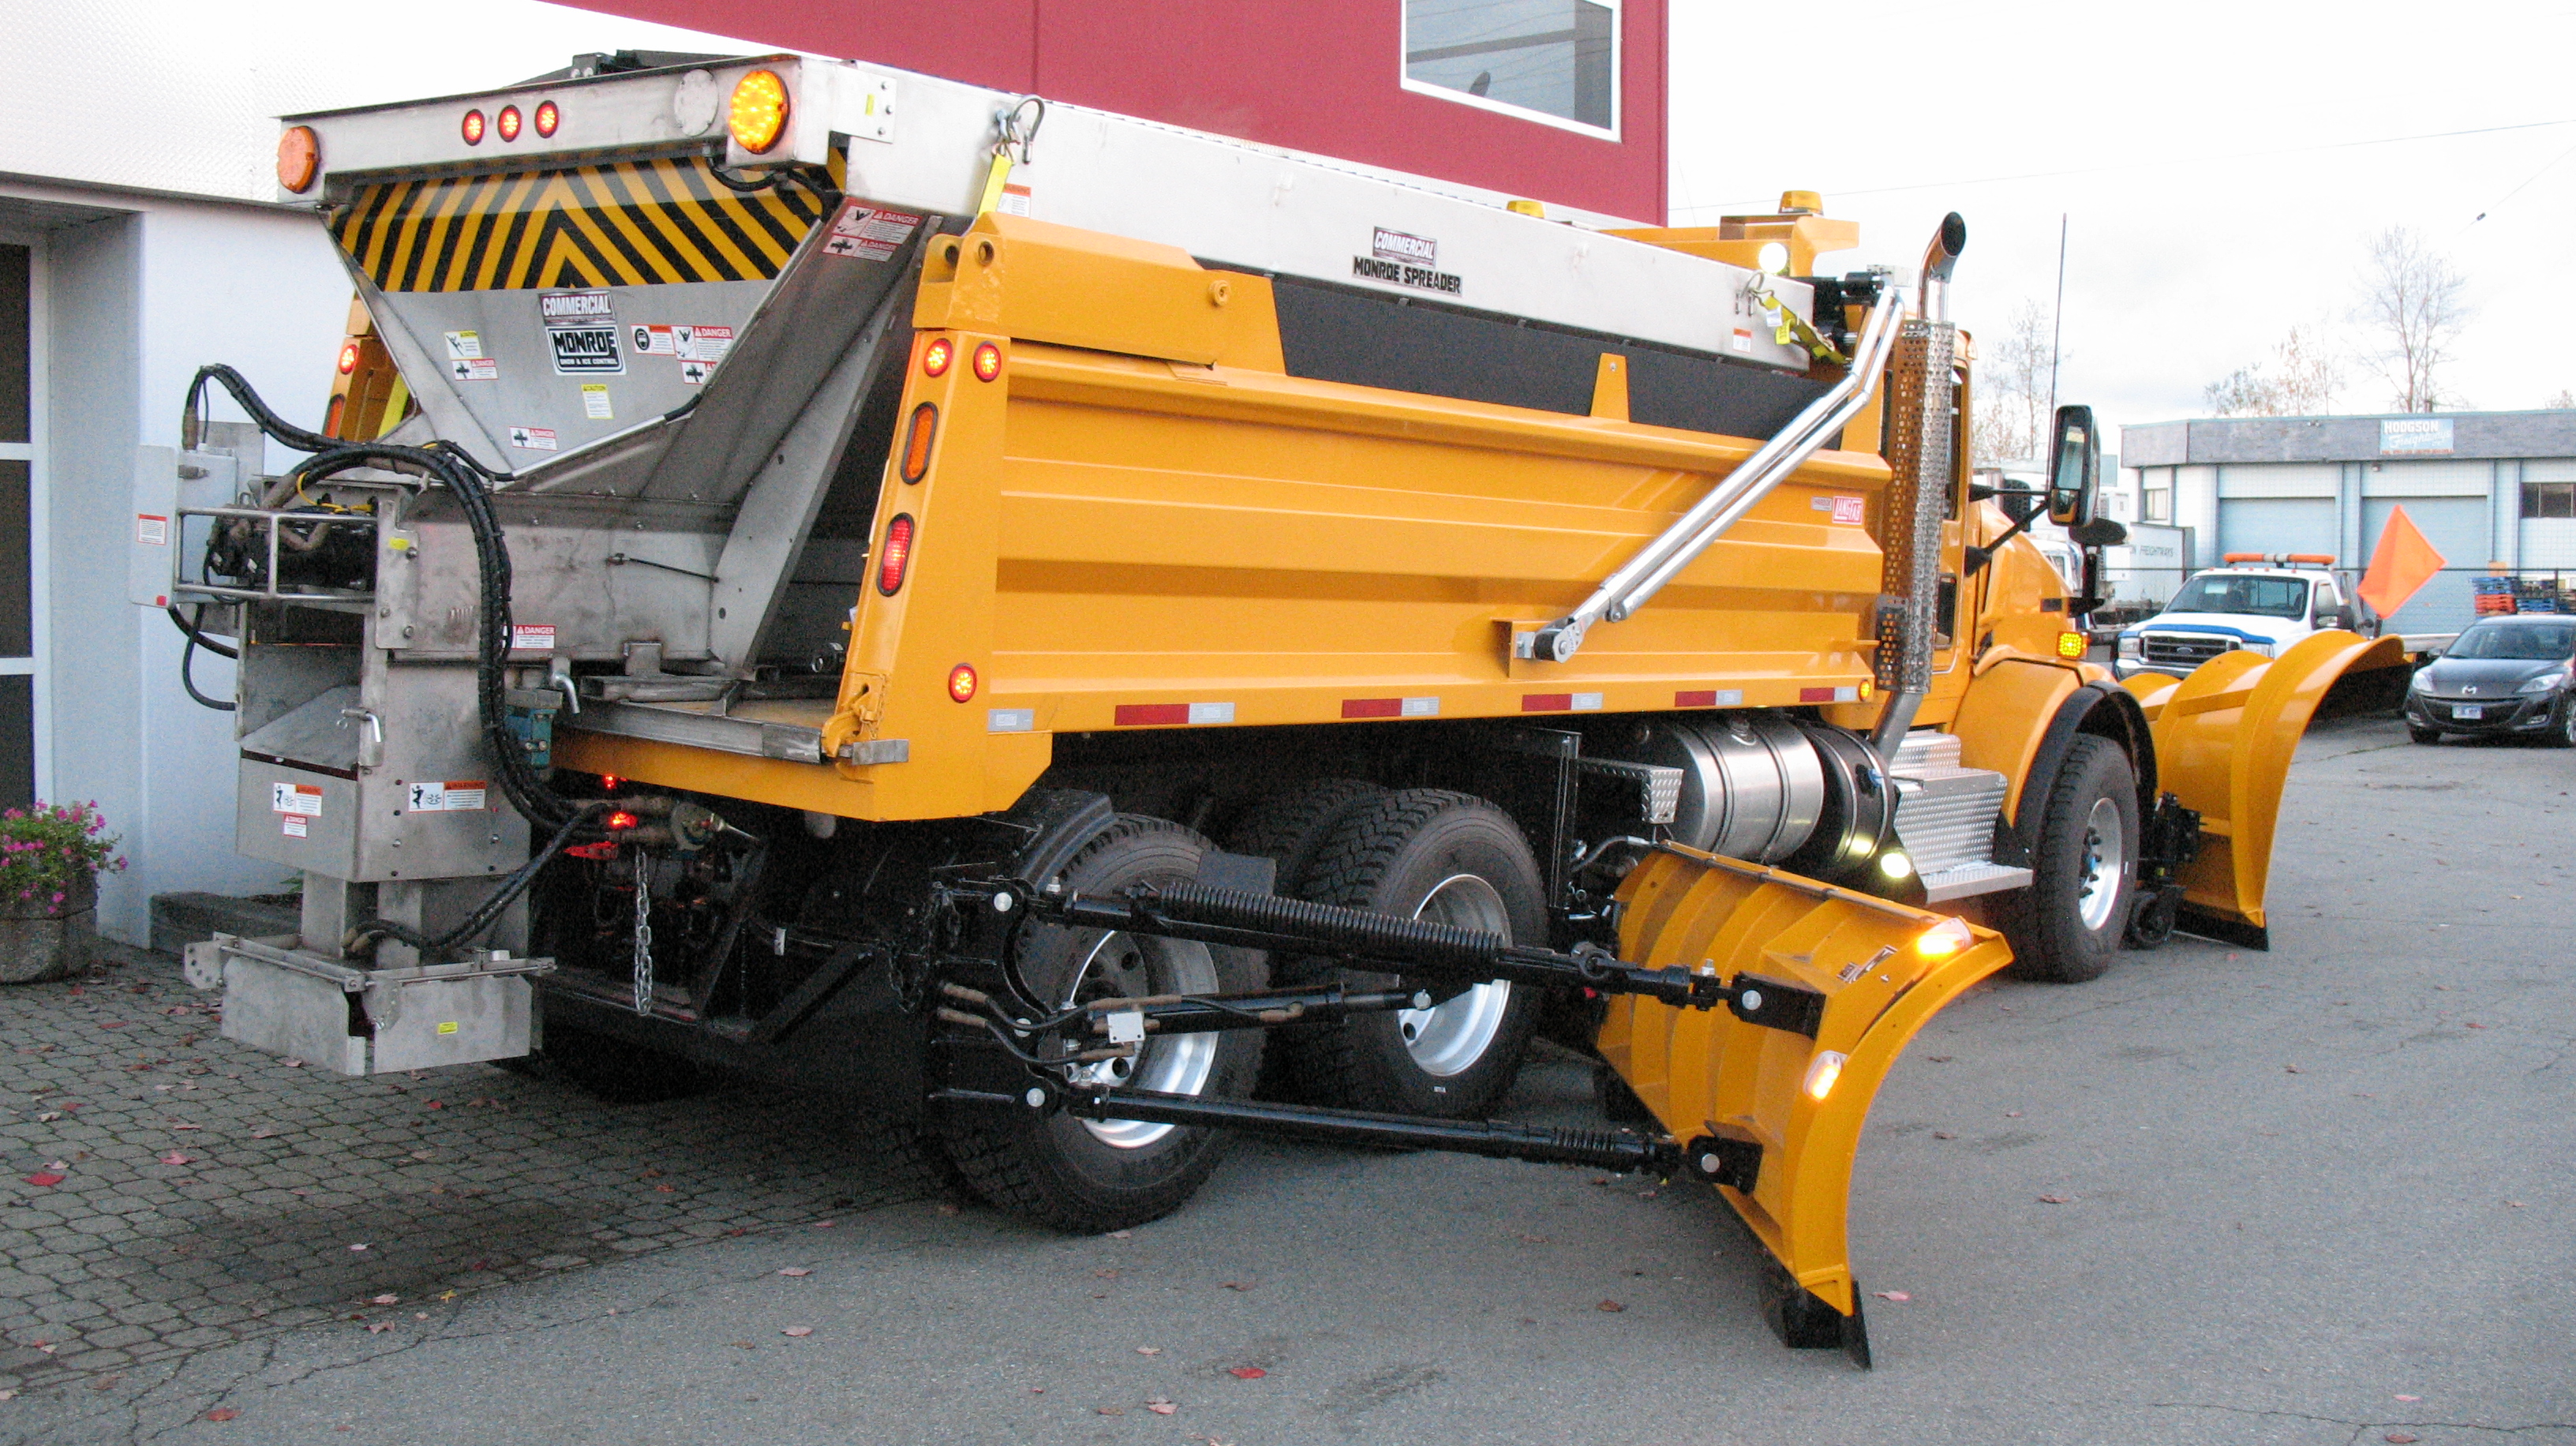 Monroe Truck Equipment >> Snow Plows and Salt Spreaders for Trucks | Commercial Truck Equipment